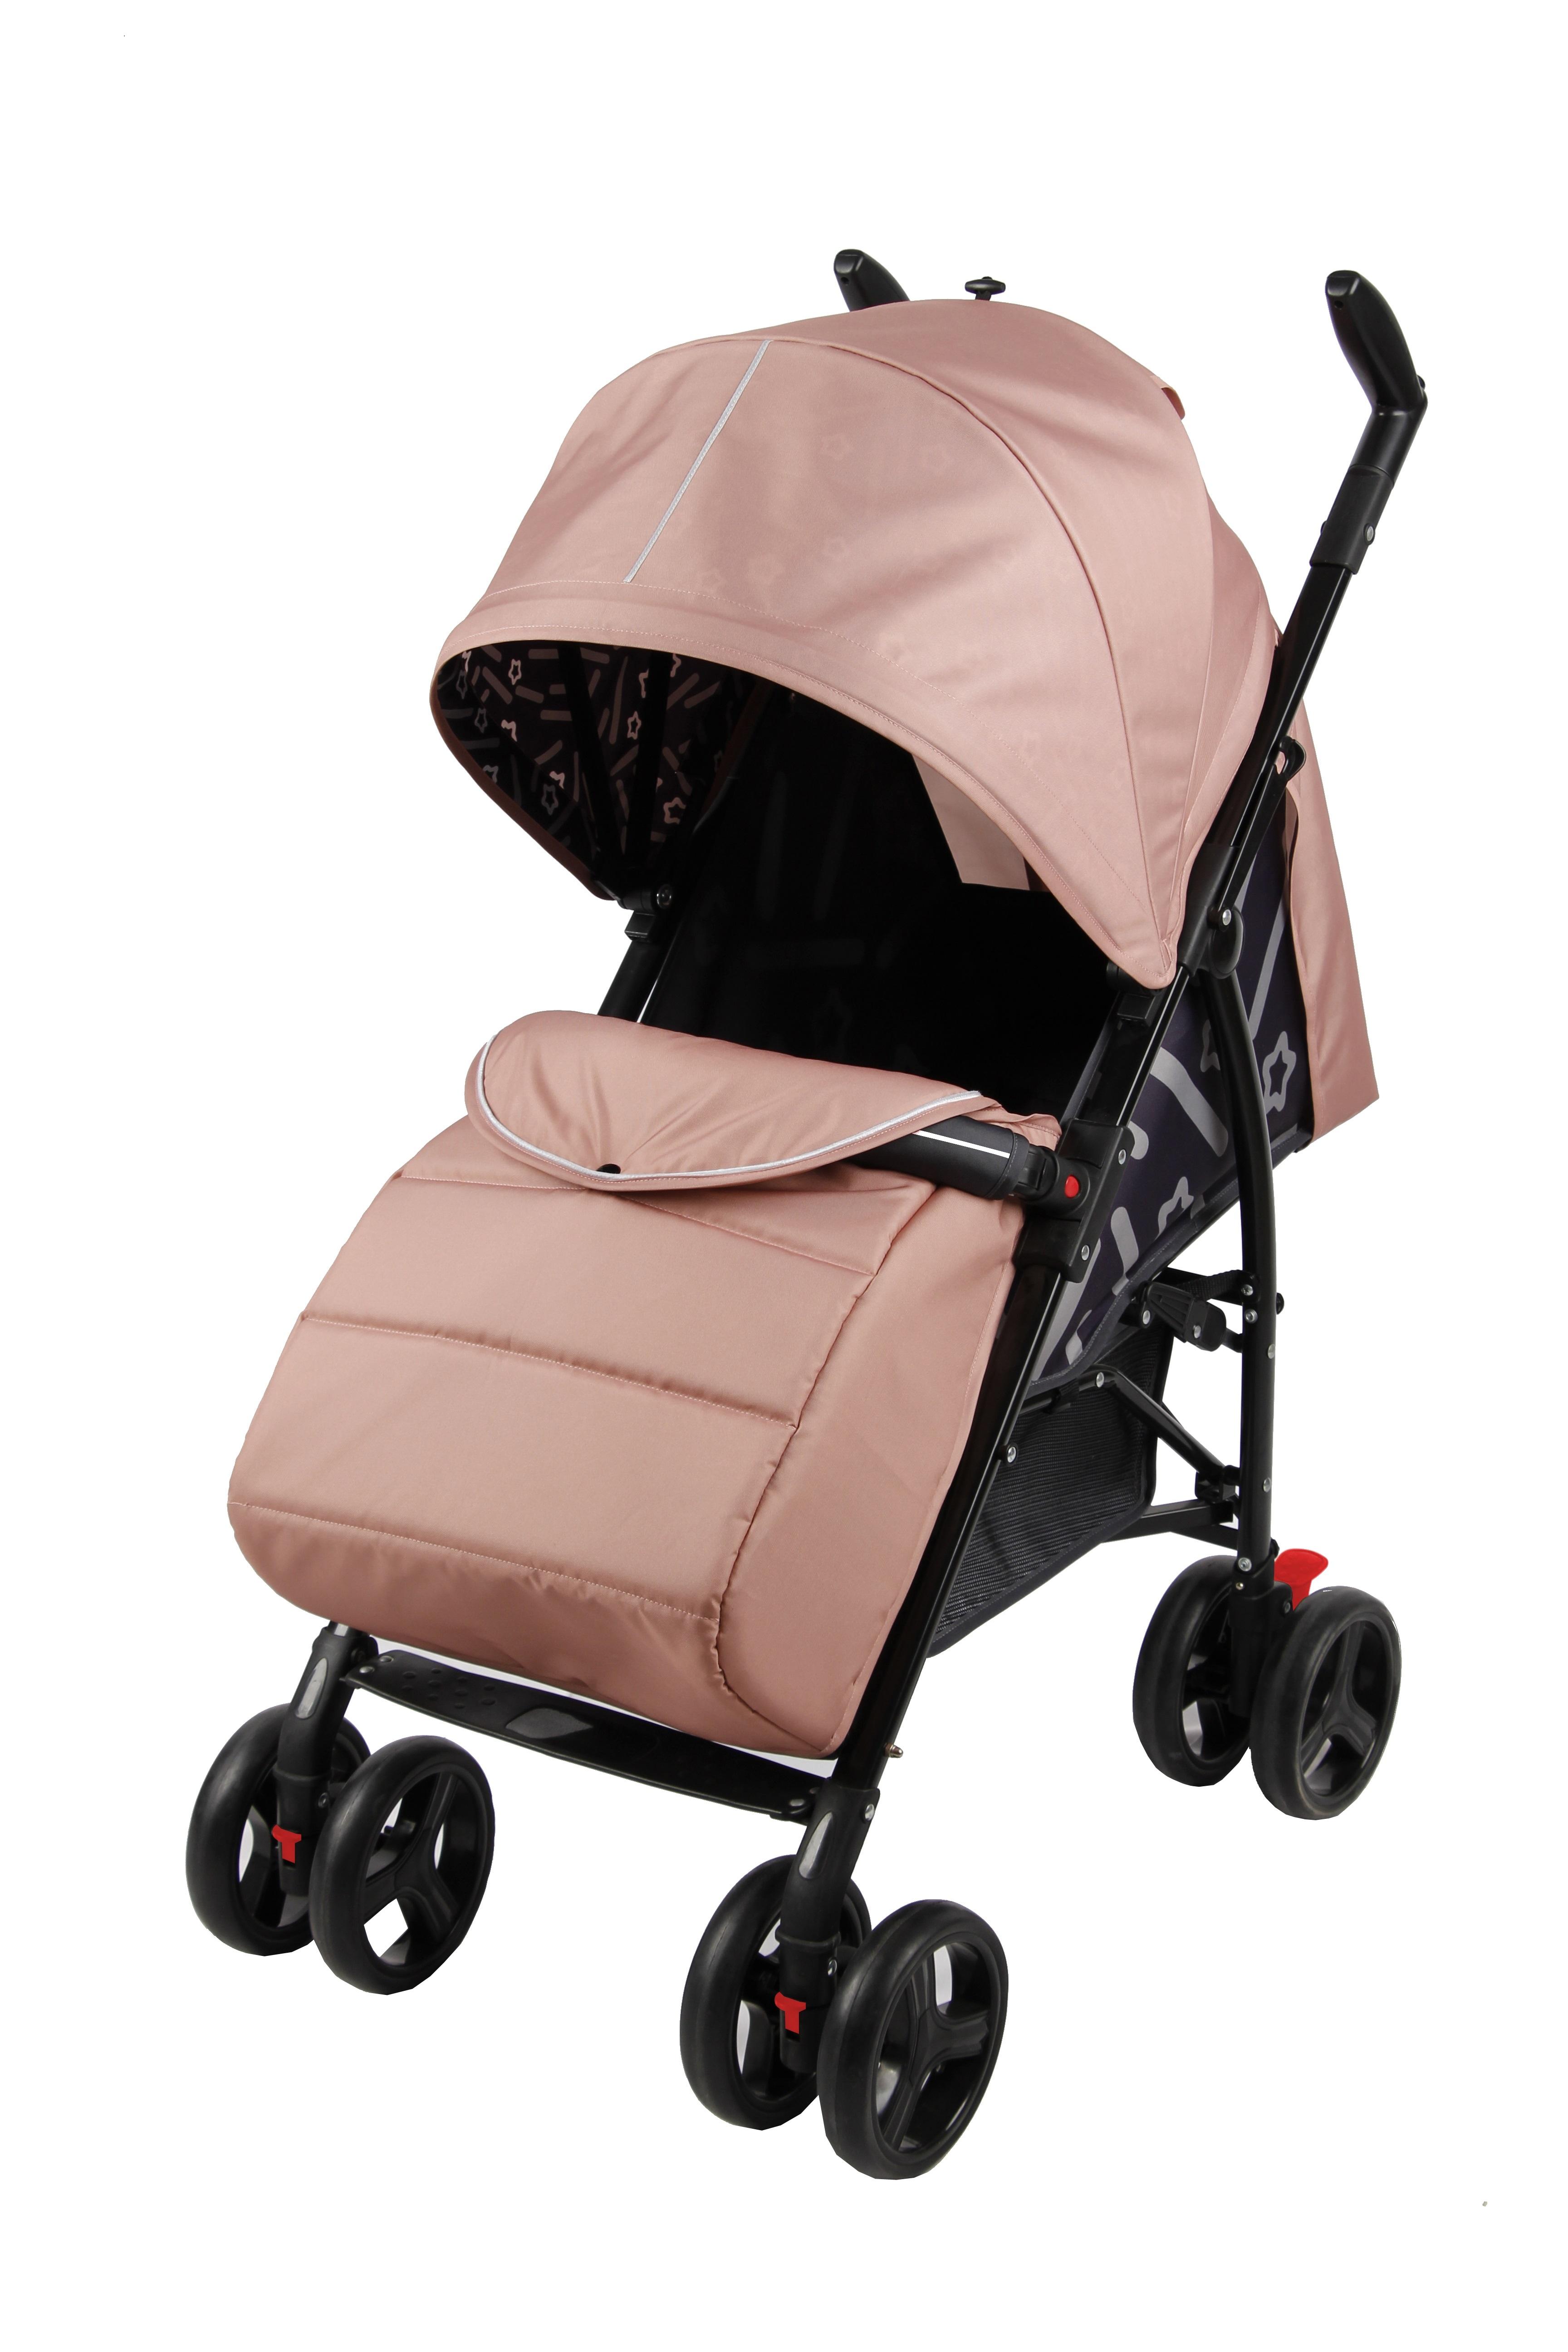 Прогулочная коляска Parusok Walker Pro розовый